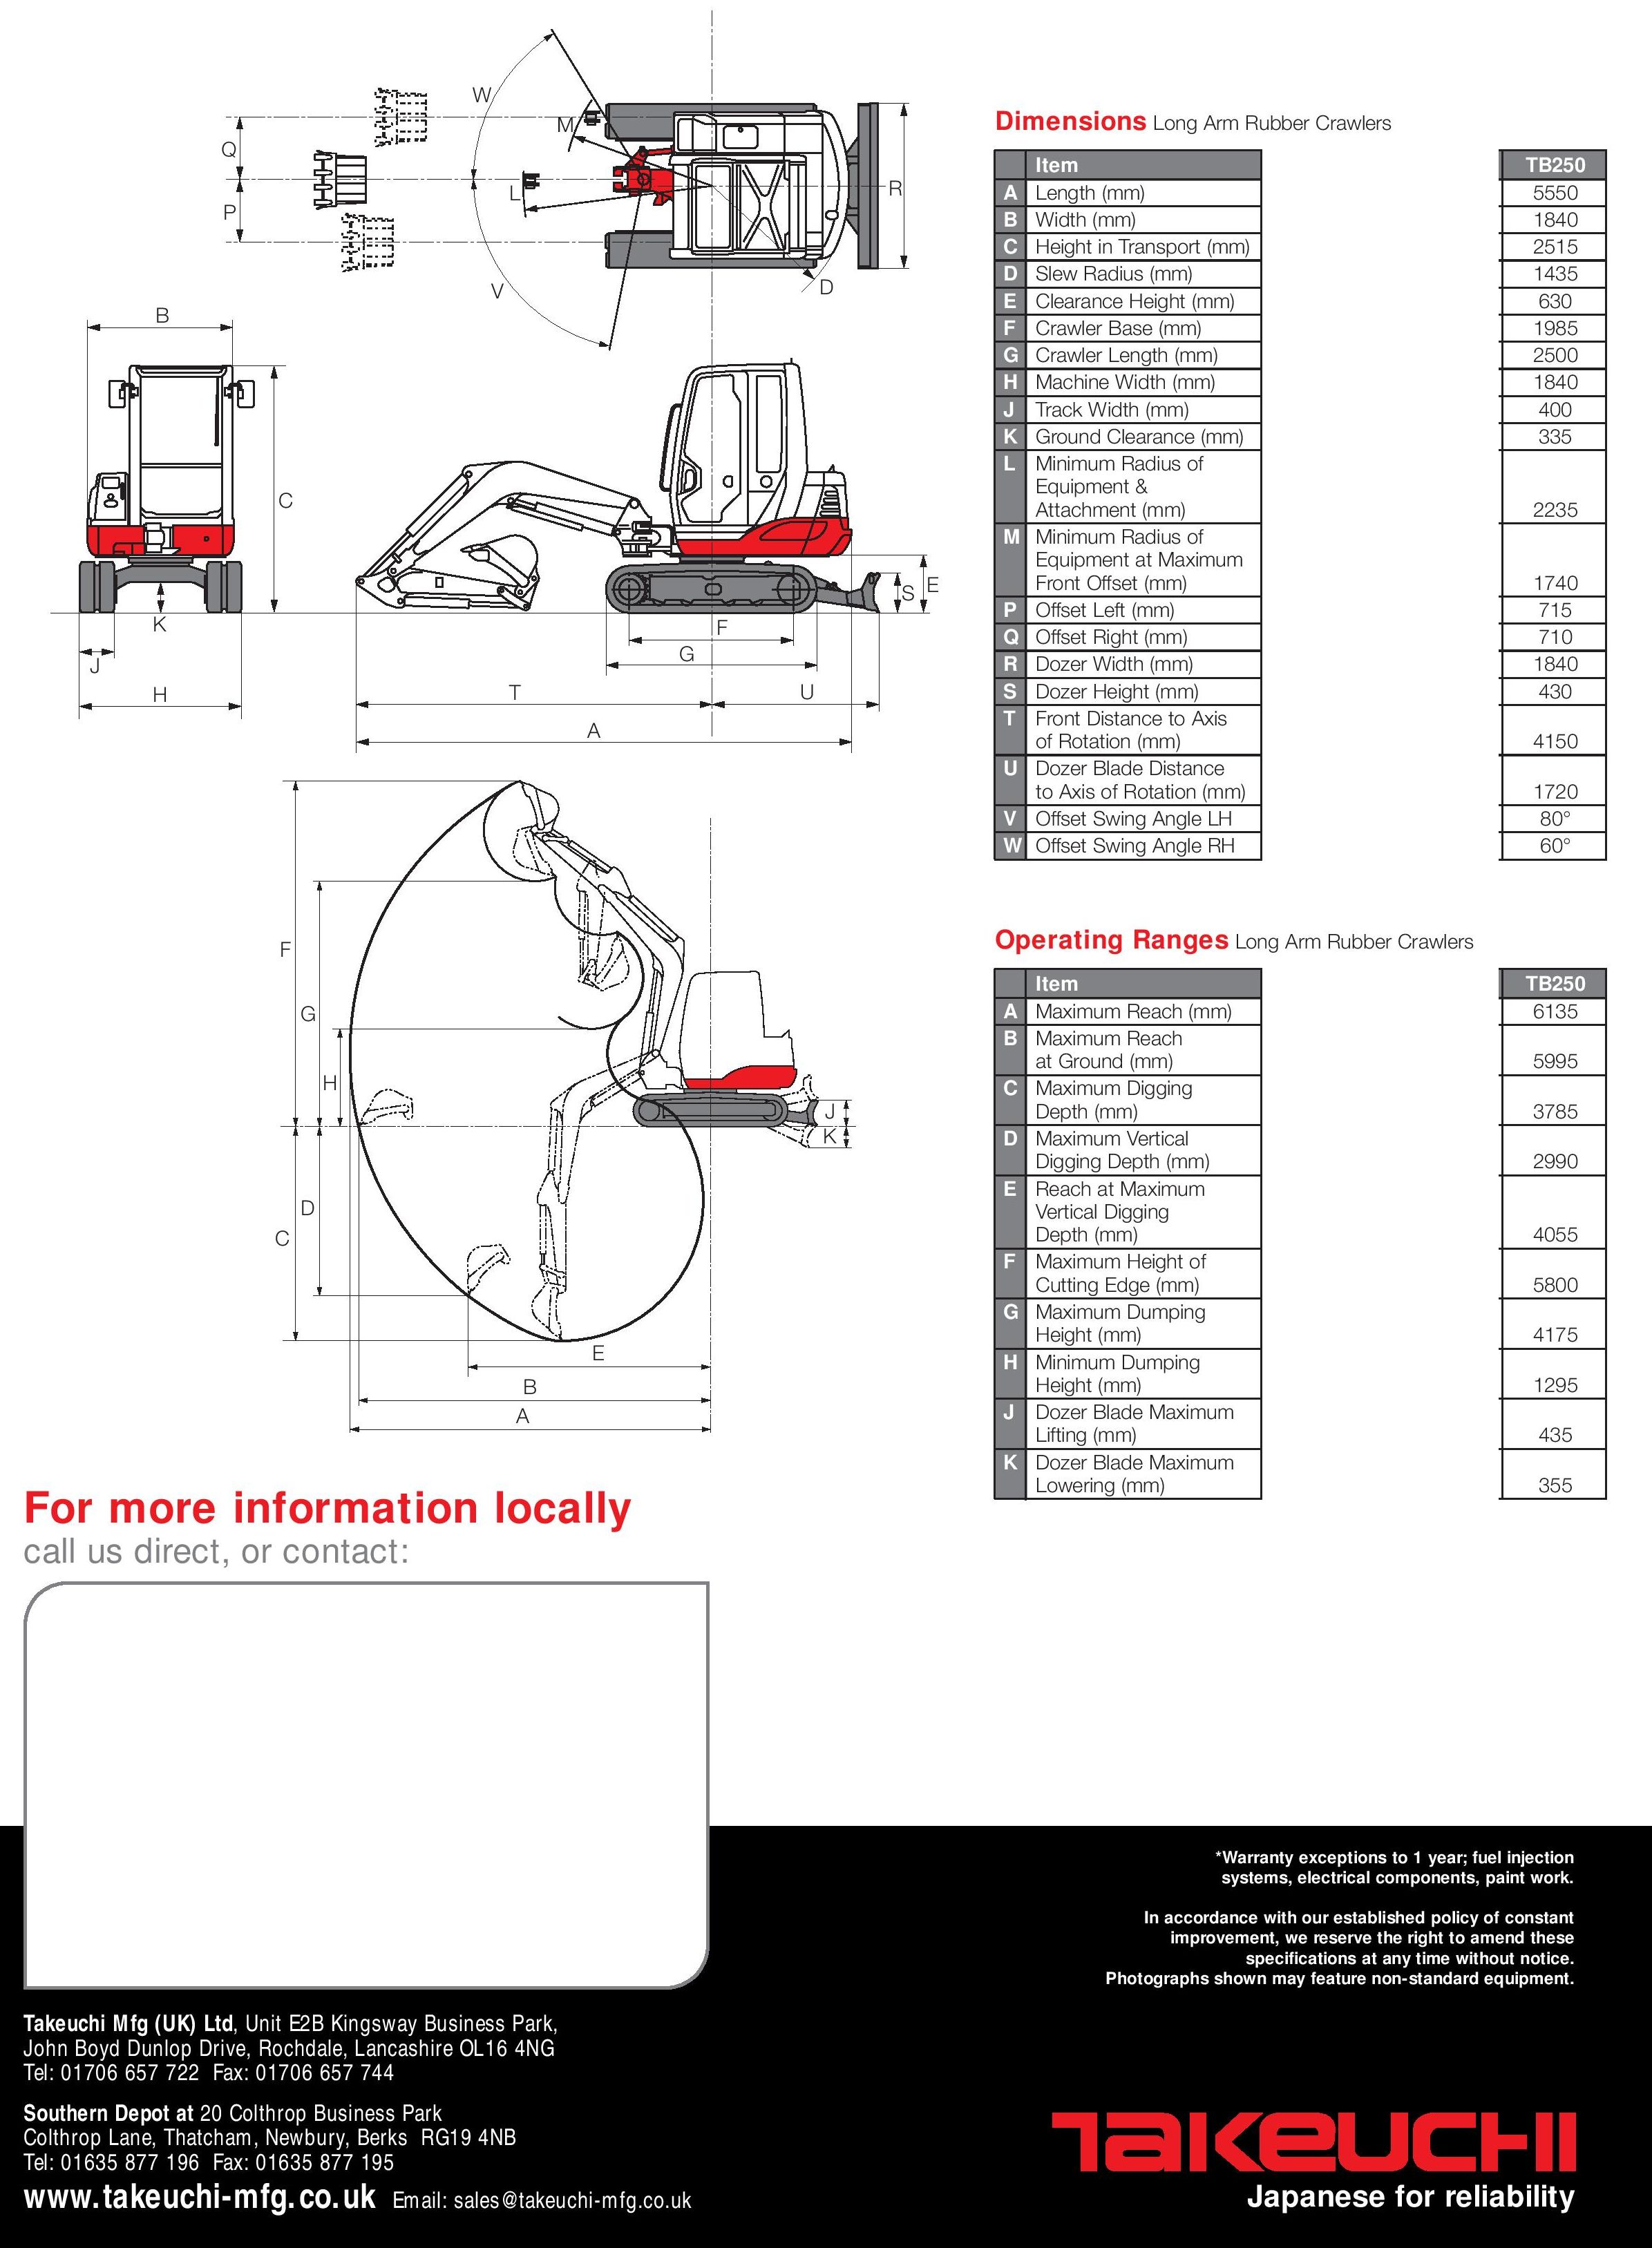 Takeuchi Excavator Supplier Worldwide | Used 2010 Takeuchi